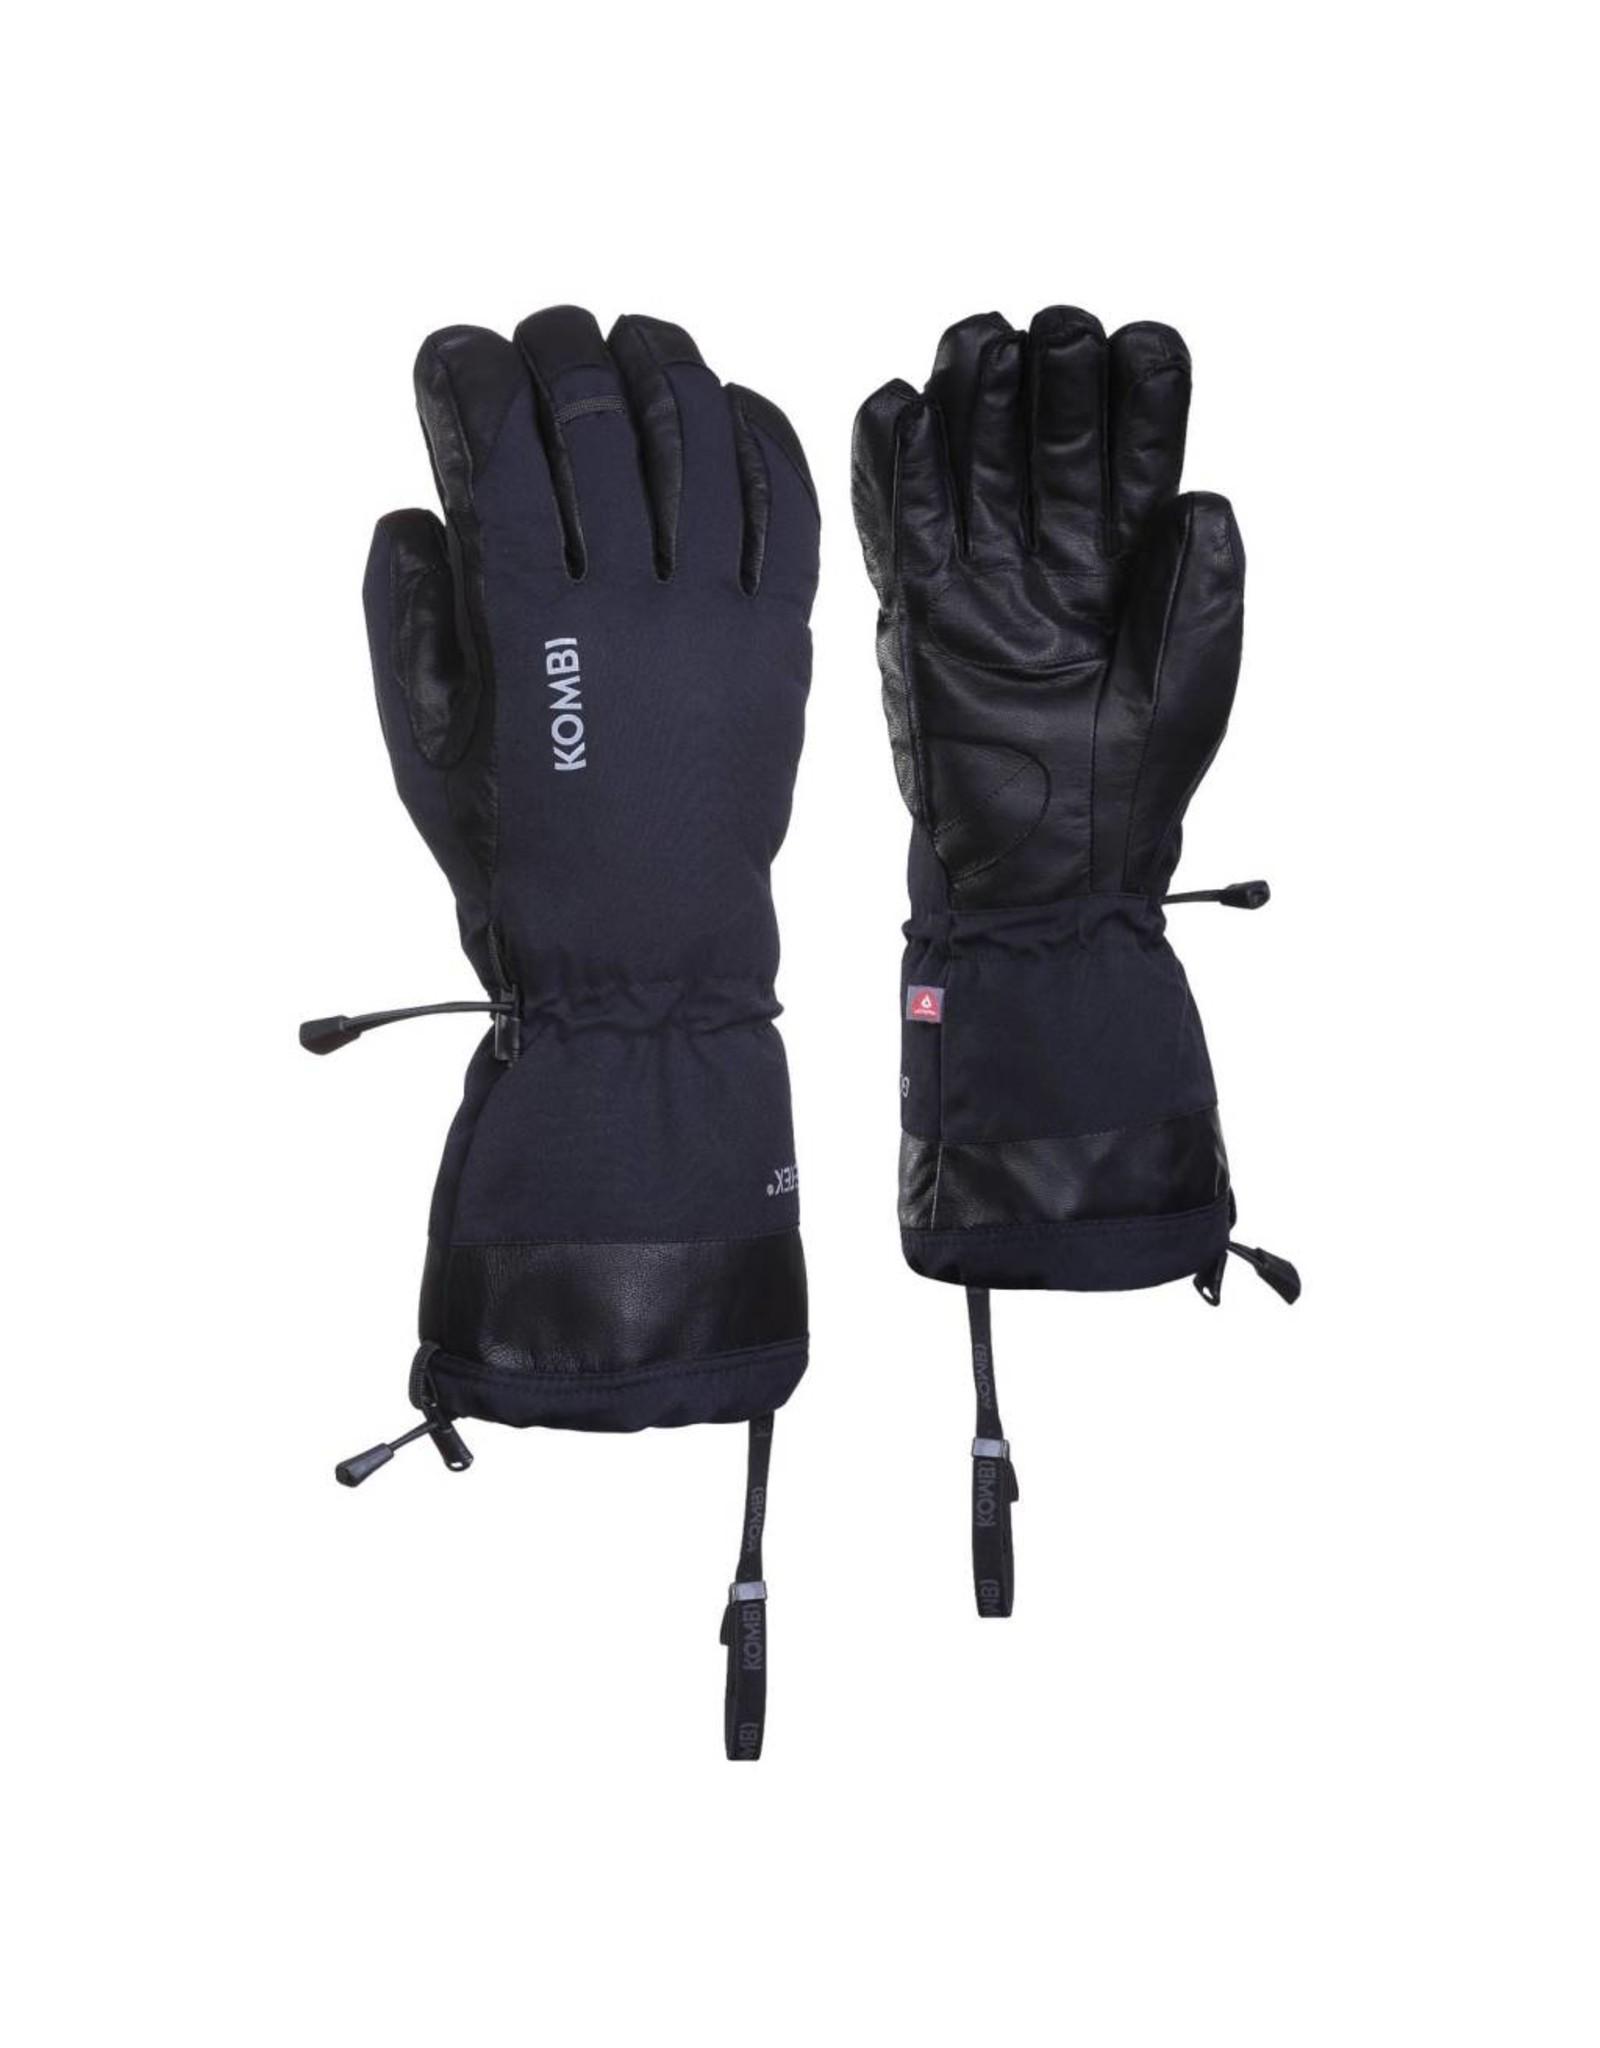 Kombi KOMBI M The Adventurer Glove F18